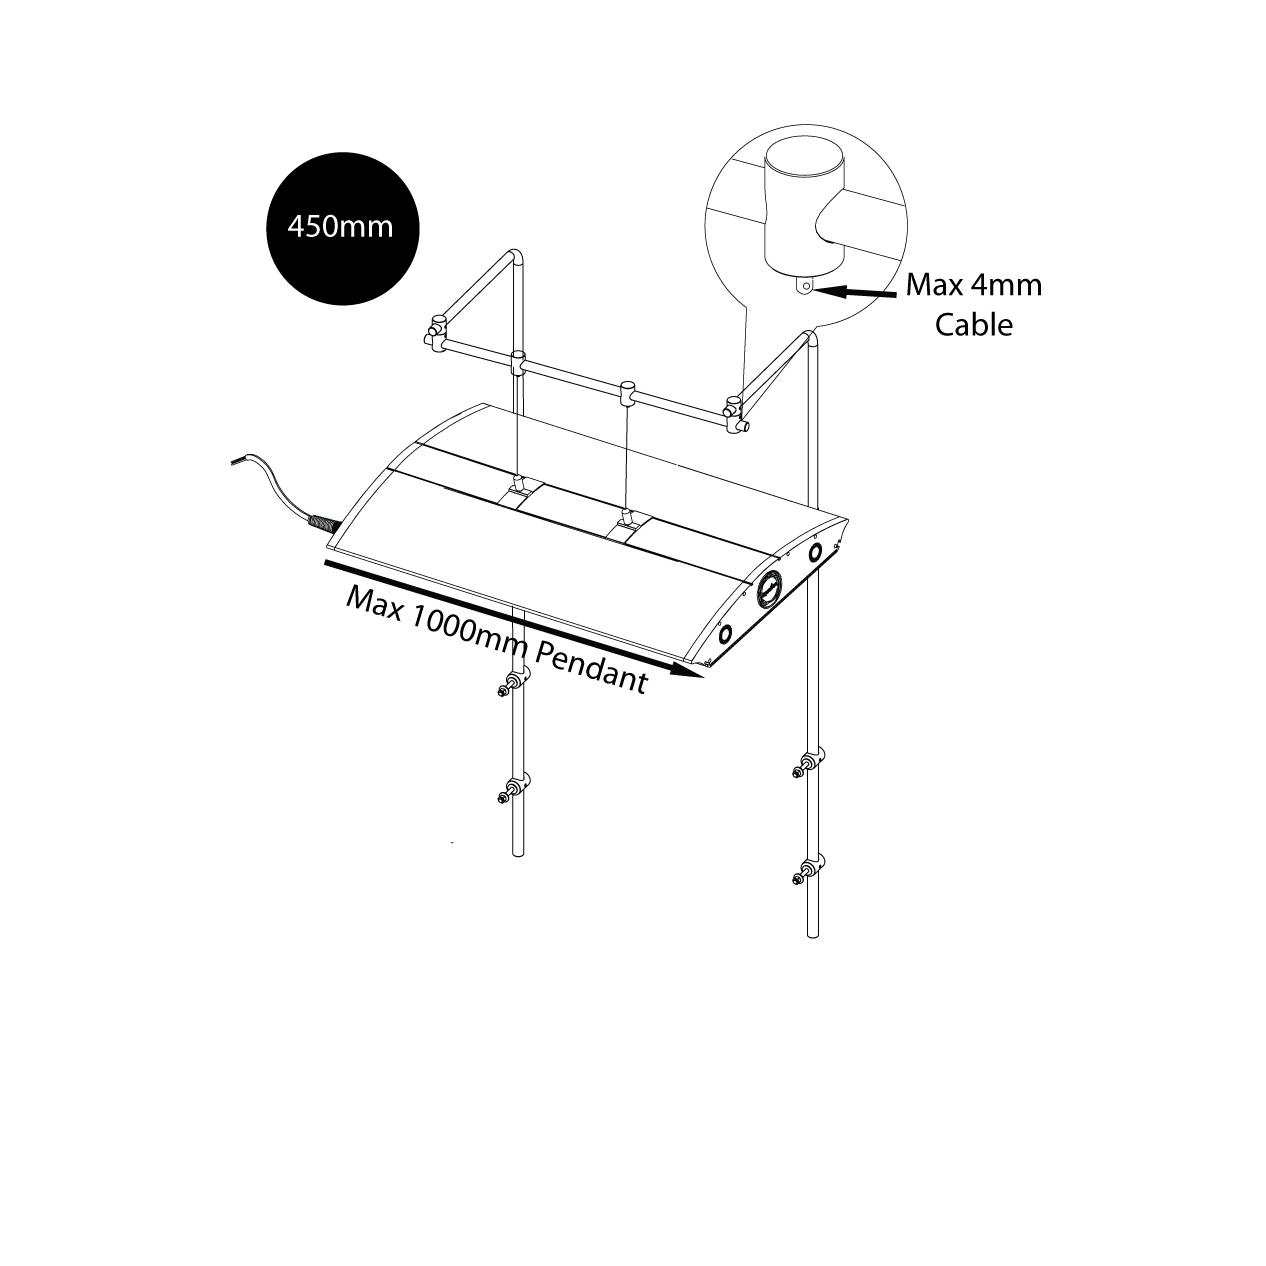 Iquatics Aqualumi T5 Controller: IQuatics Universal Aquarium Lighting Mounting Kit/Hanging